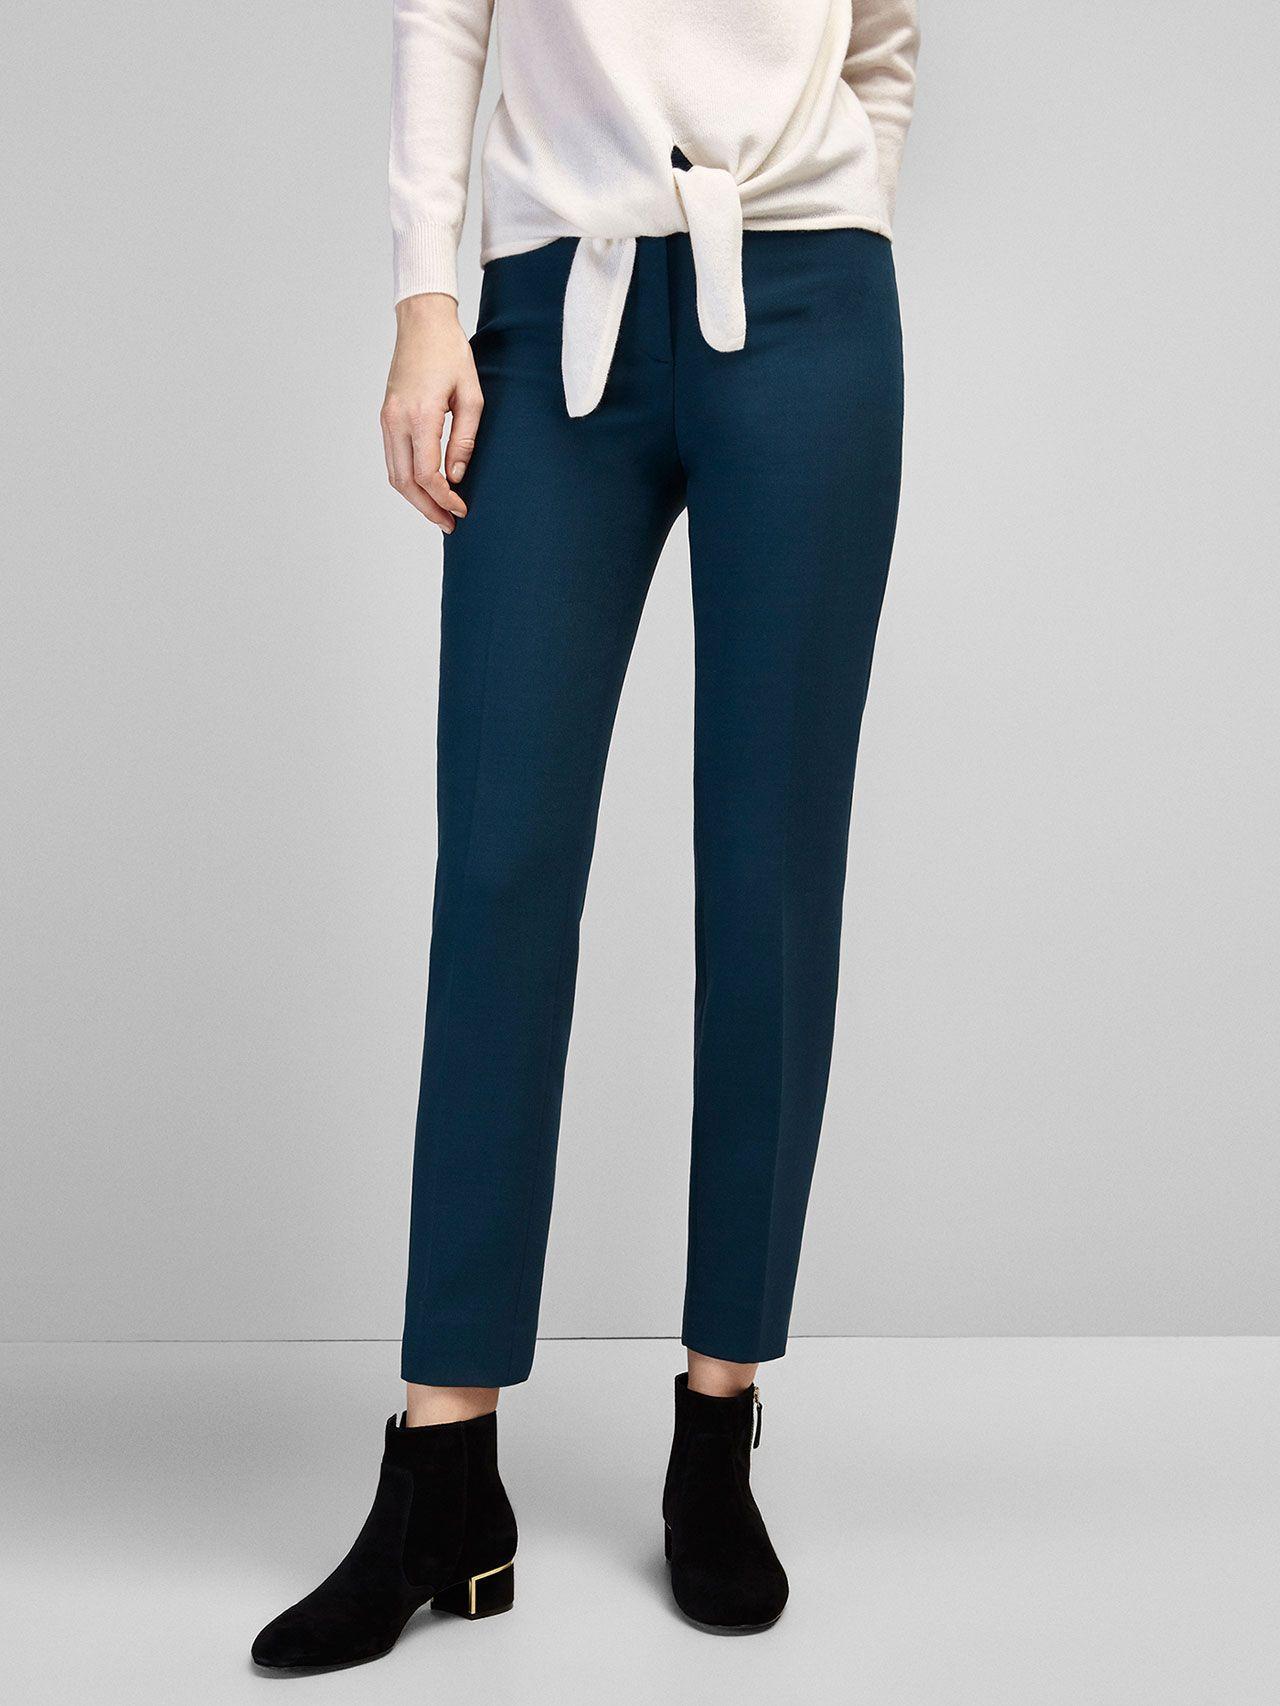 dcecfd203 Rebajas pantalones y jeans de mujer